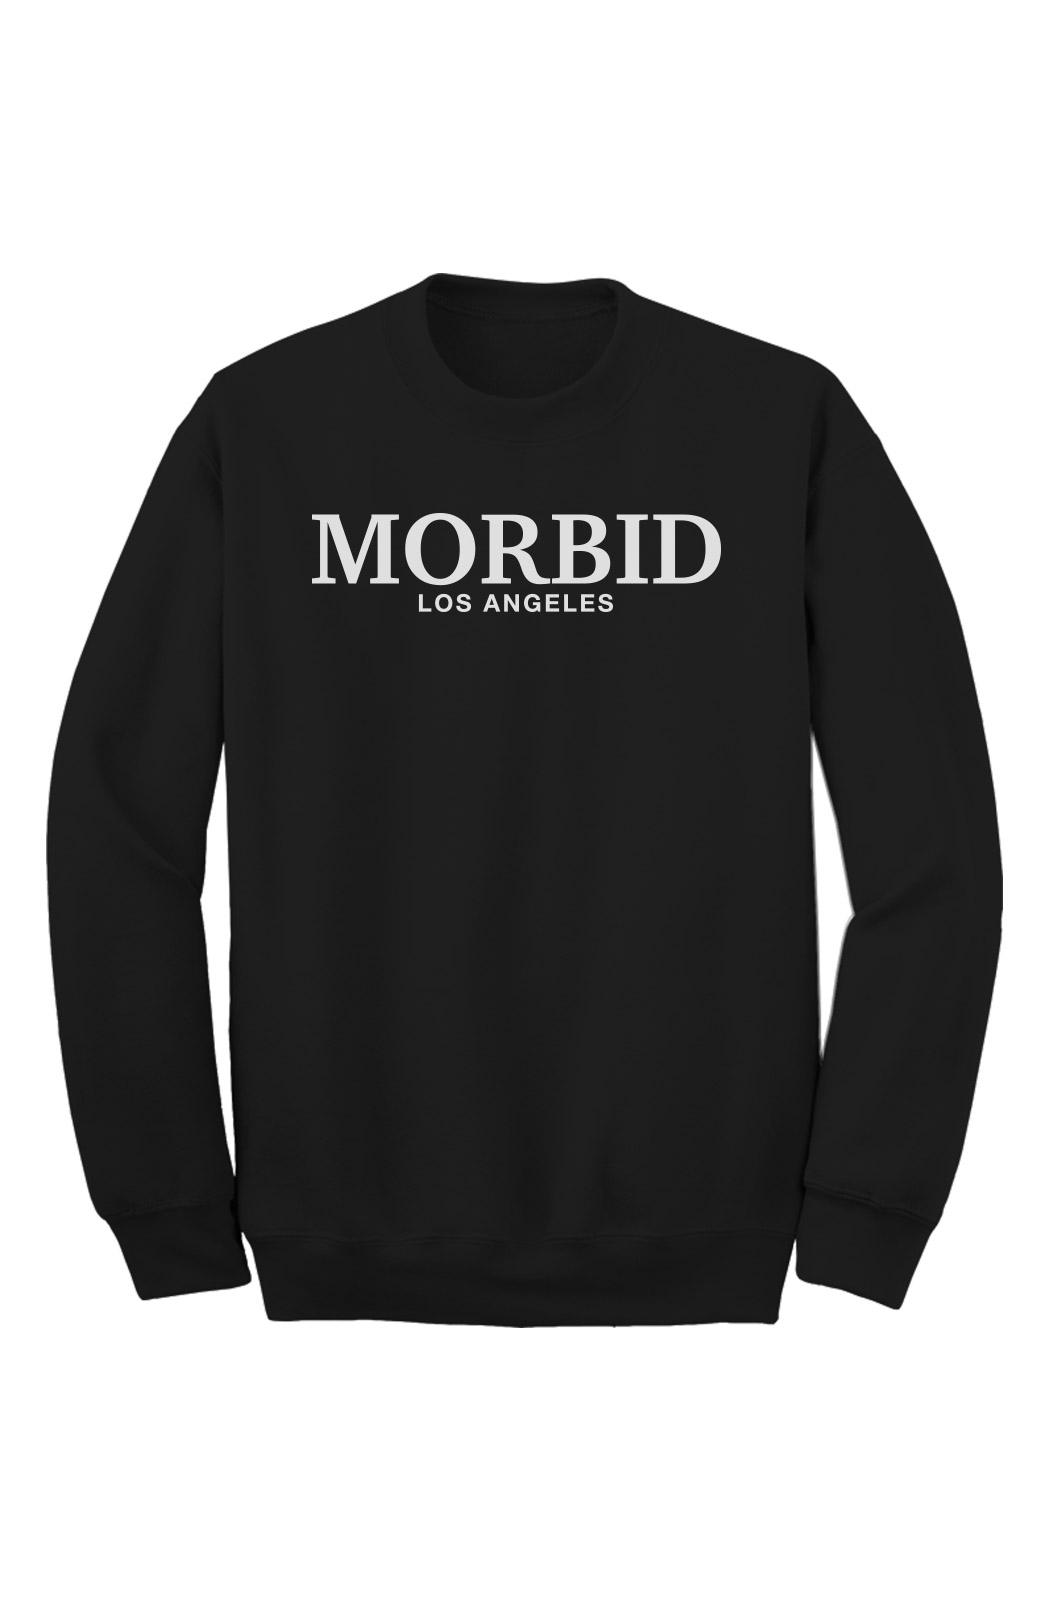 MORBID Los Angeles Clothing Black Fancy Type Crew Sweater Streetwear